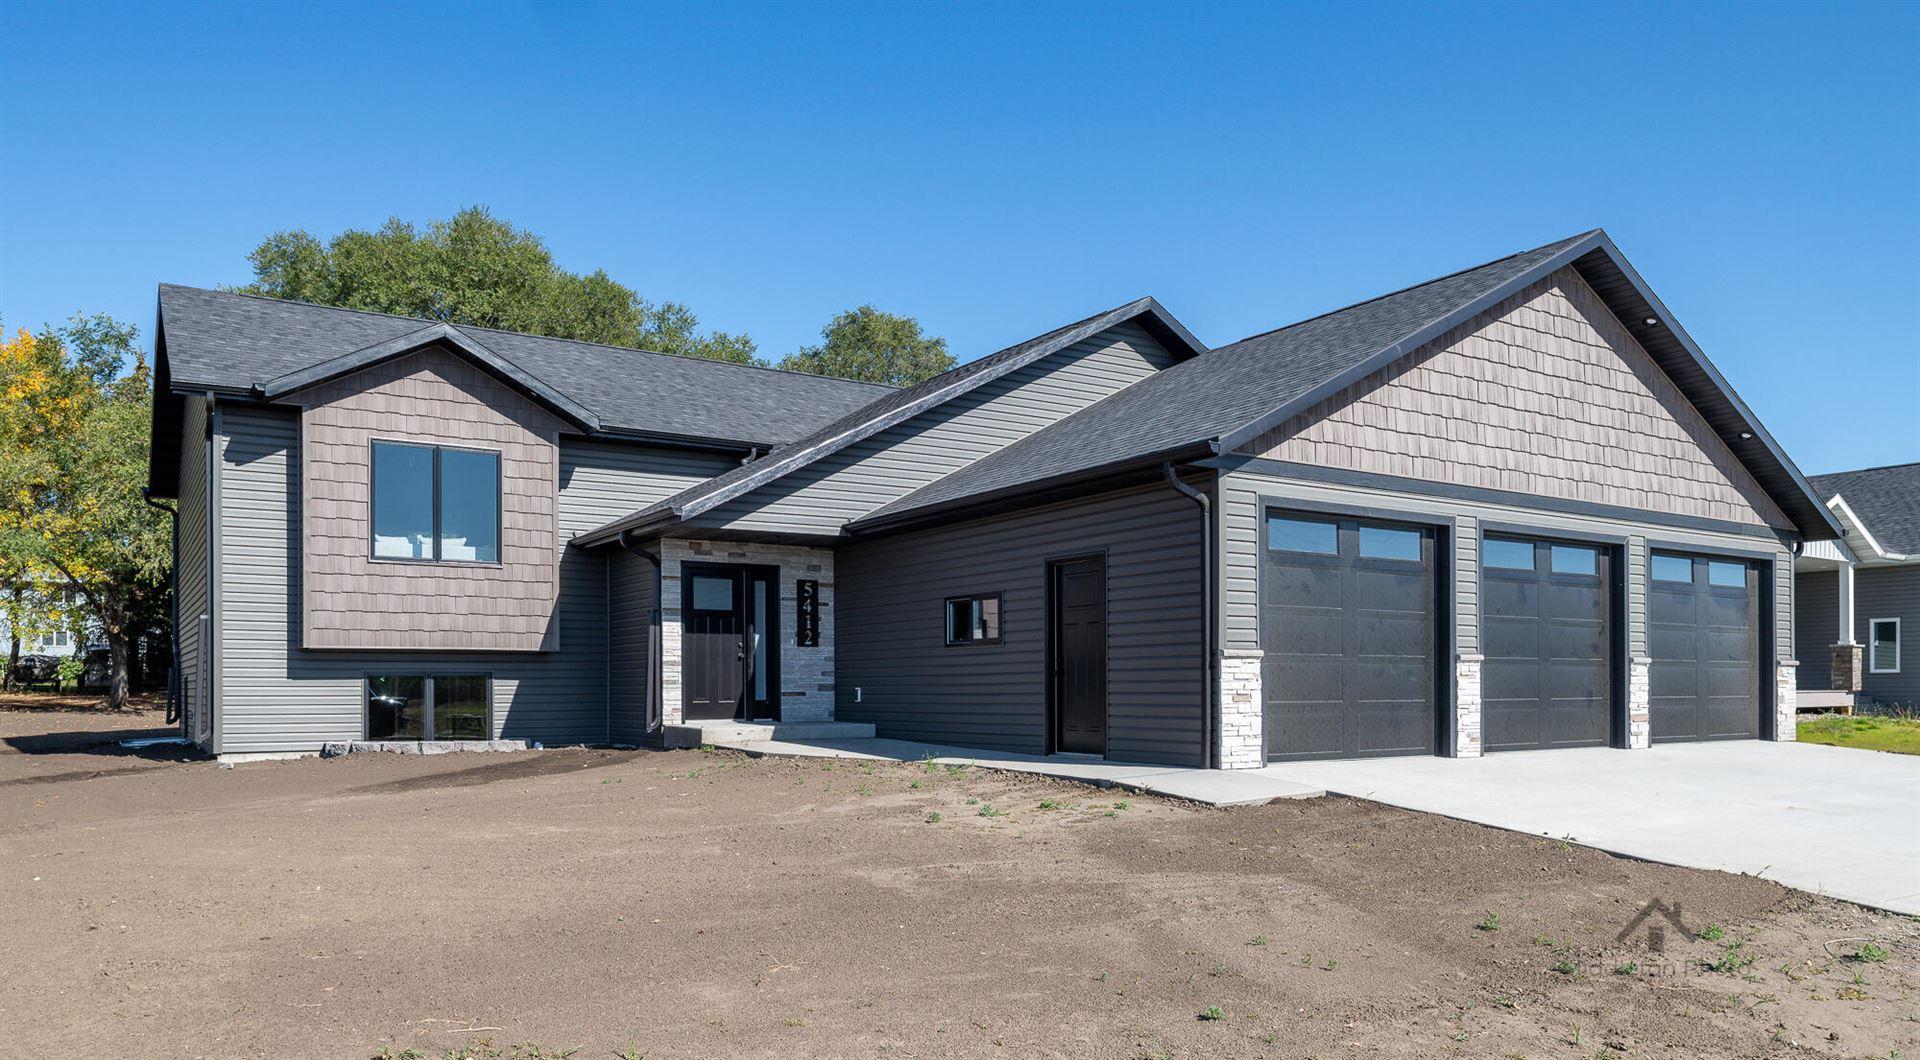 5412 Hendrickson Drive, Bismarck, ND 58503 - #: 412385